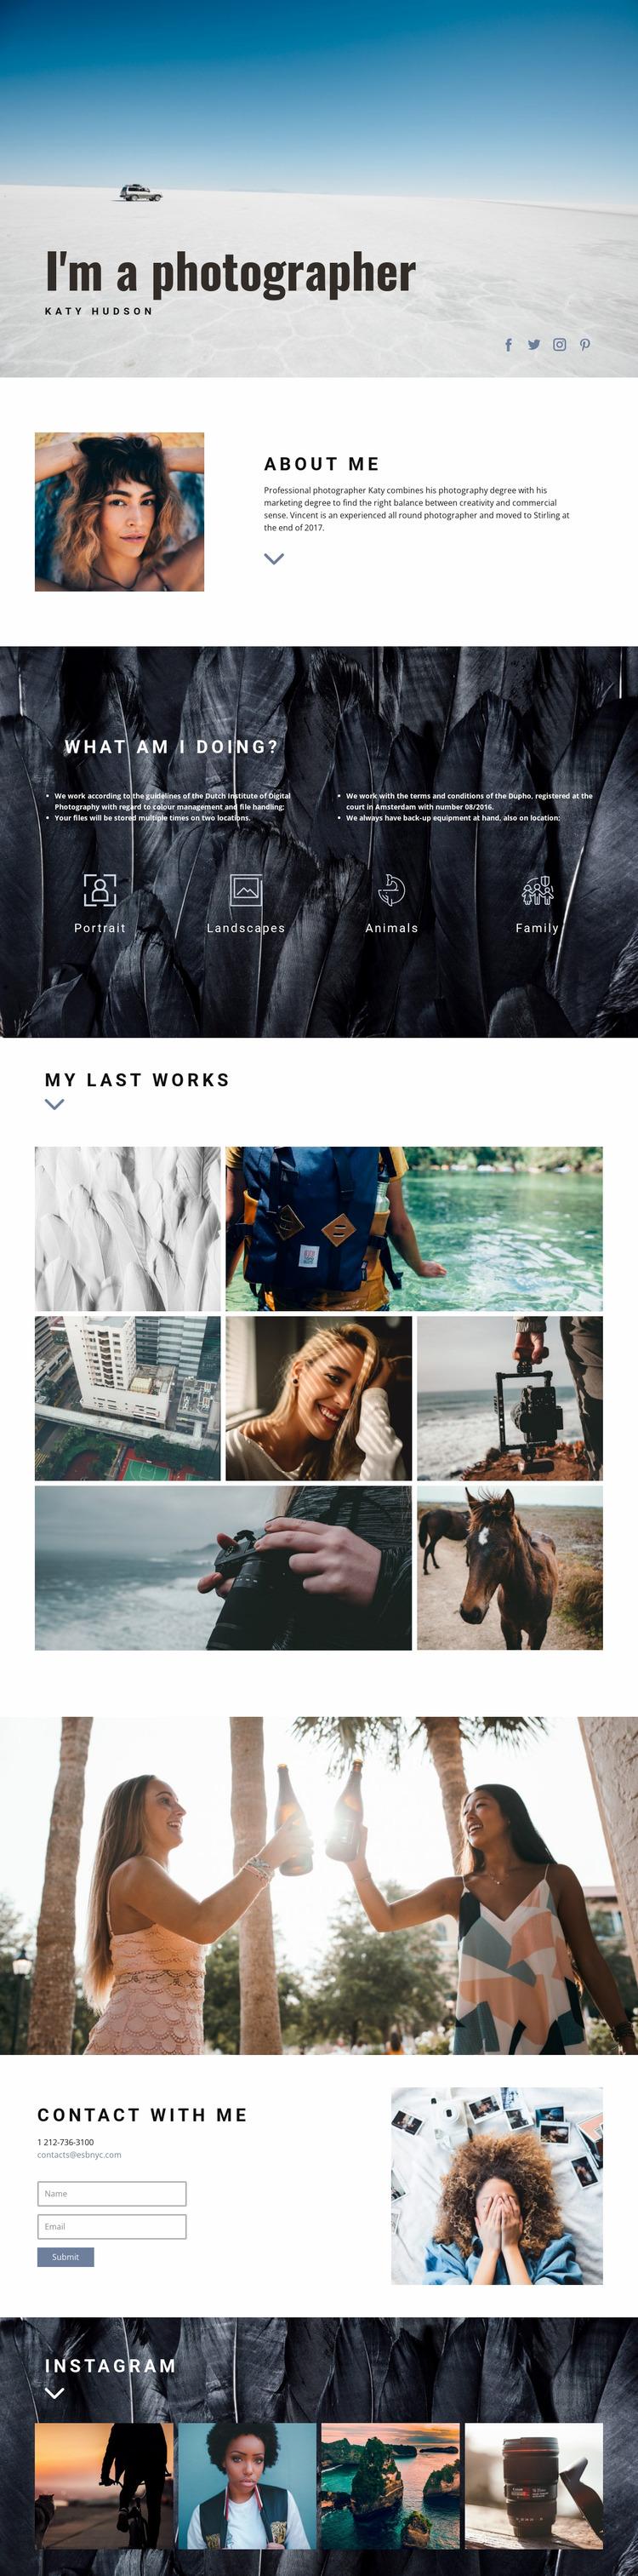 Personal webiste art WordPress Website Builder